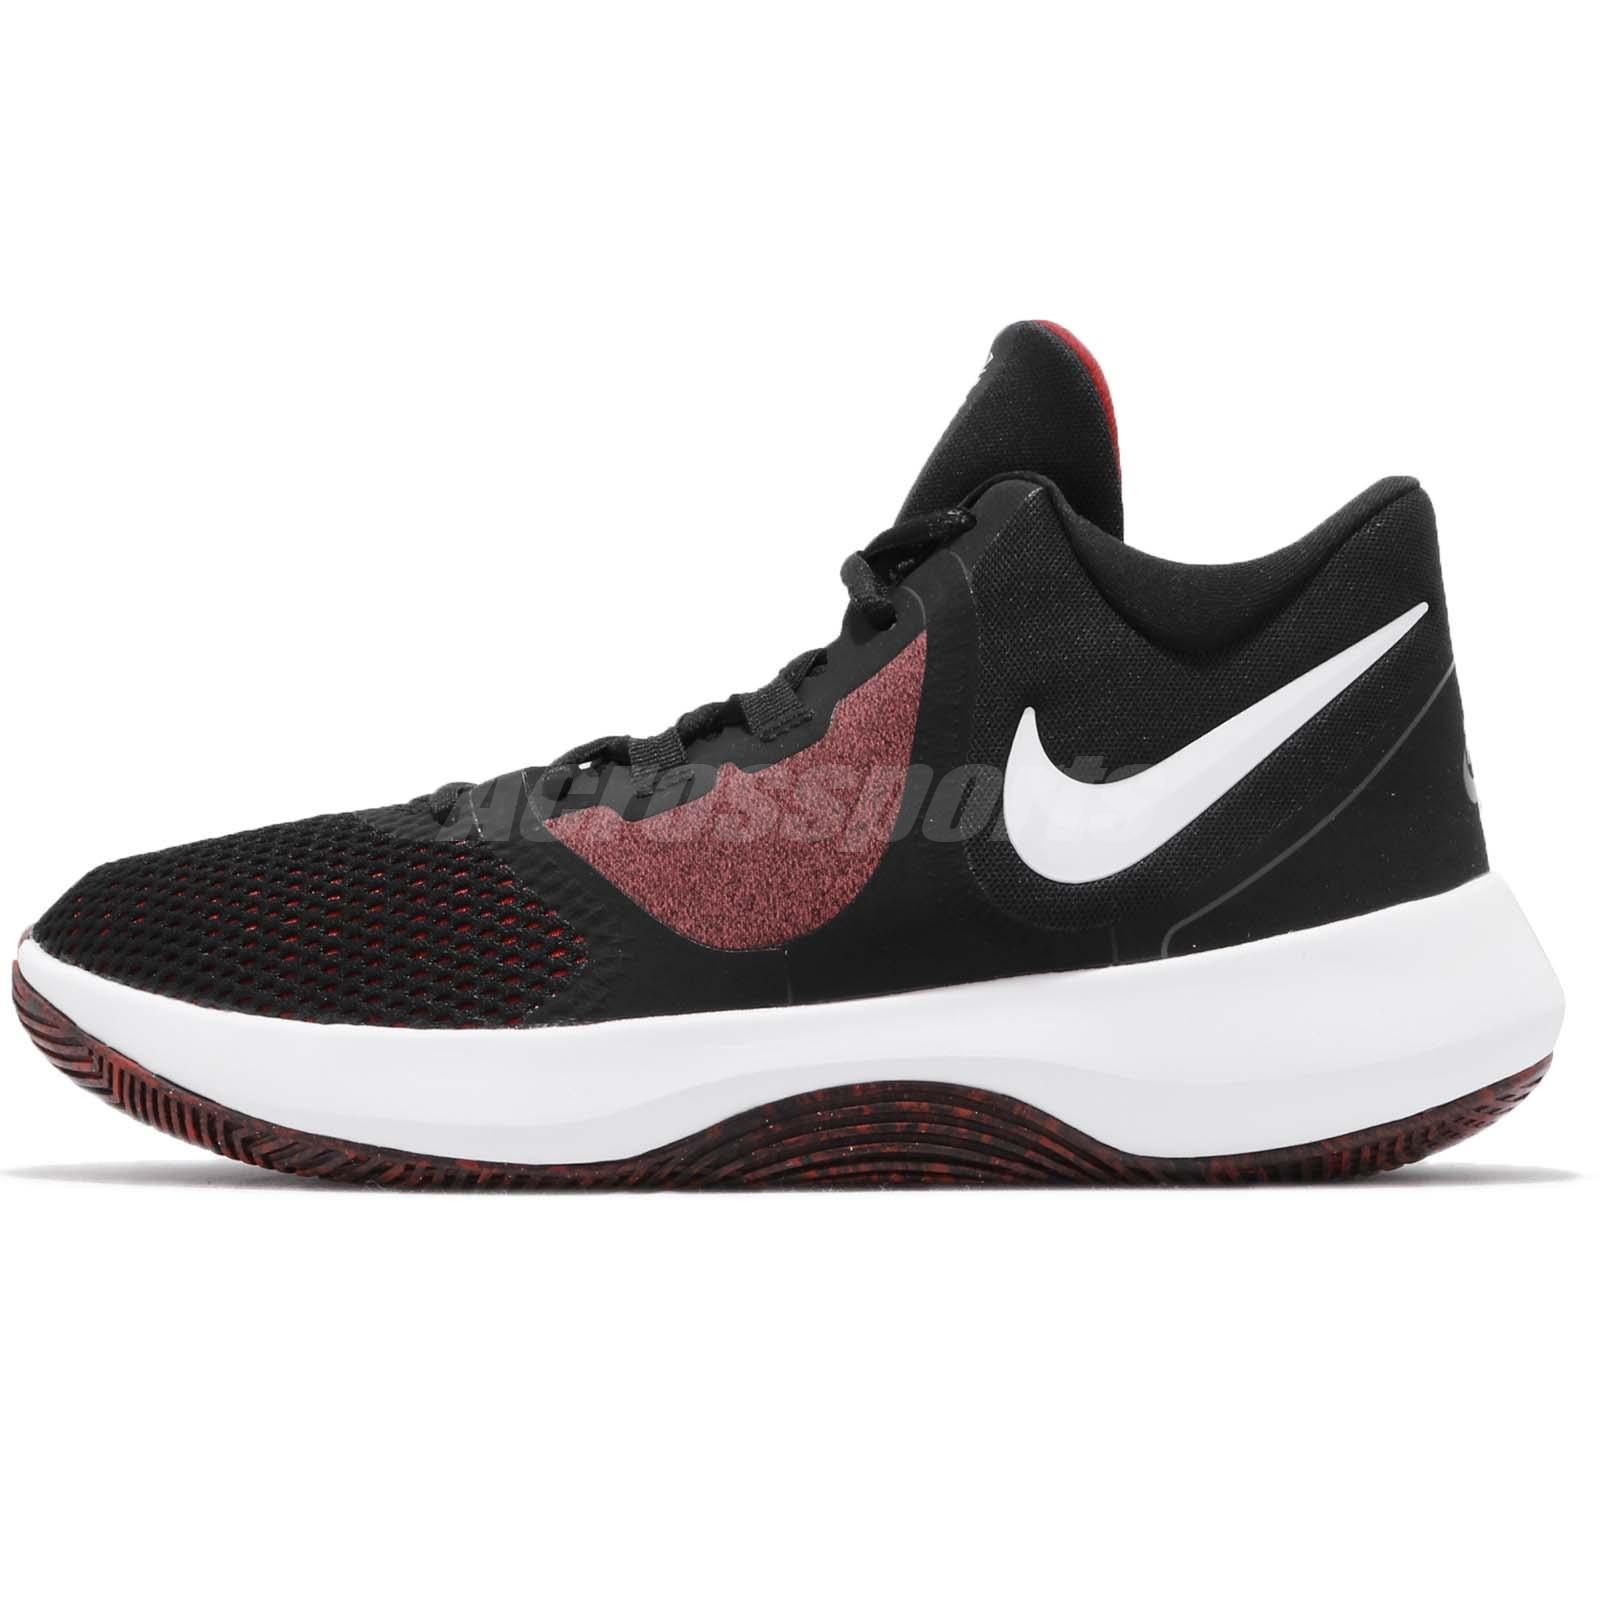 779c67b8b36 Nike Air Precision II 2 Black White Red Men Basketball Shoes Sneakers AA7069 -006